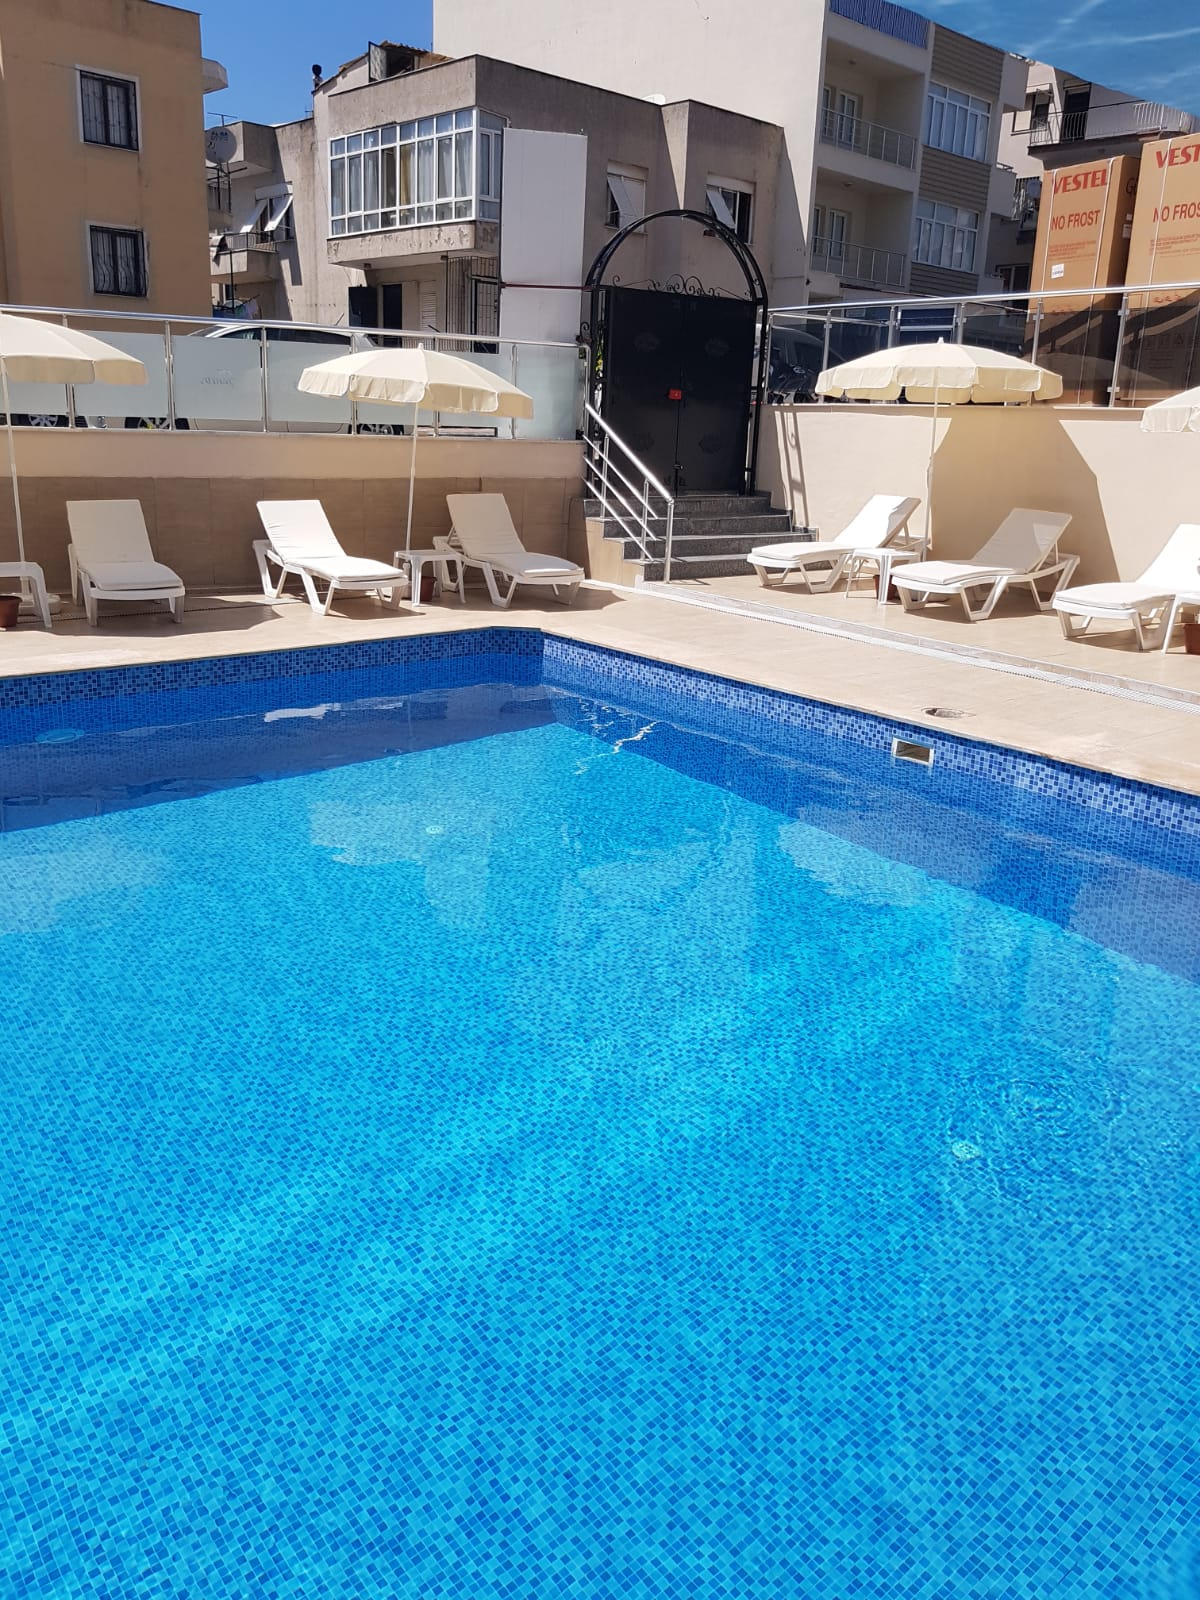 Letovanje Turska autobusom, Kusadasi, Hotel Santur,izgled bazena